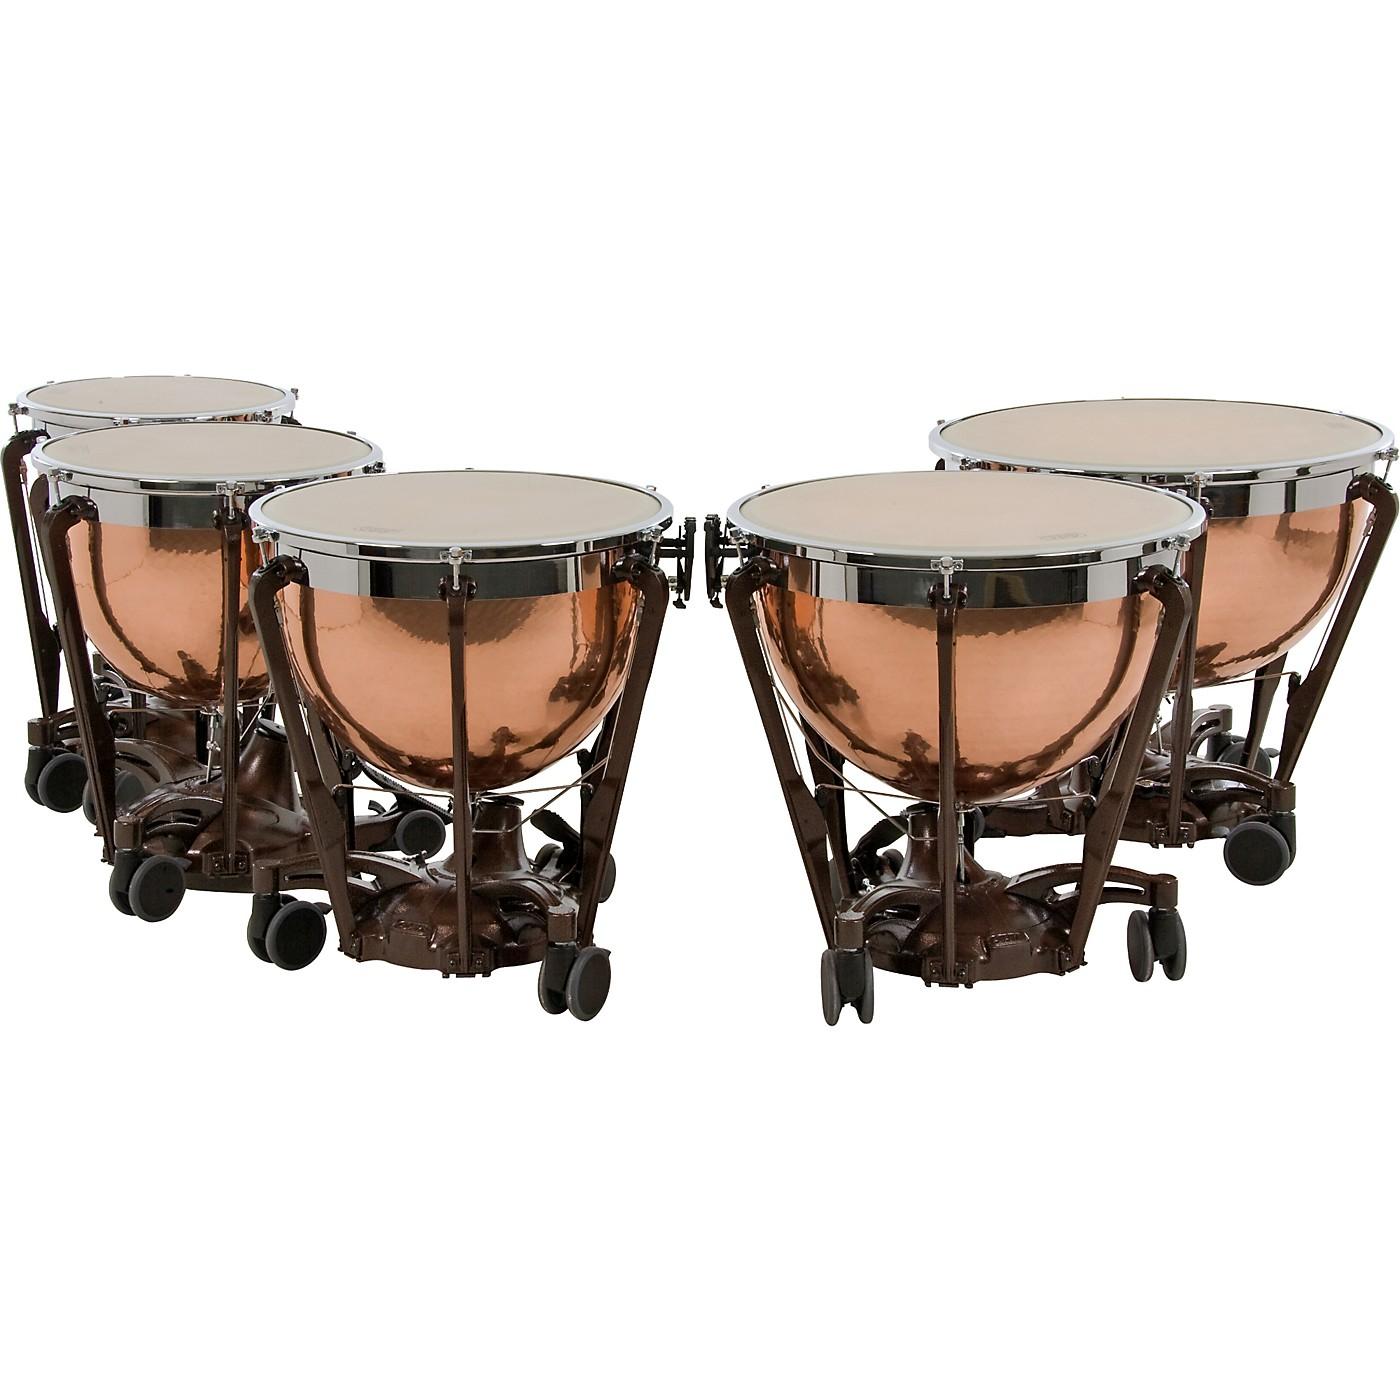 Adams Professional Series Generation II Hammered Copper Timpani, Set of 5 thumbnail